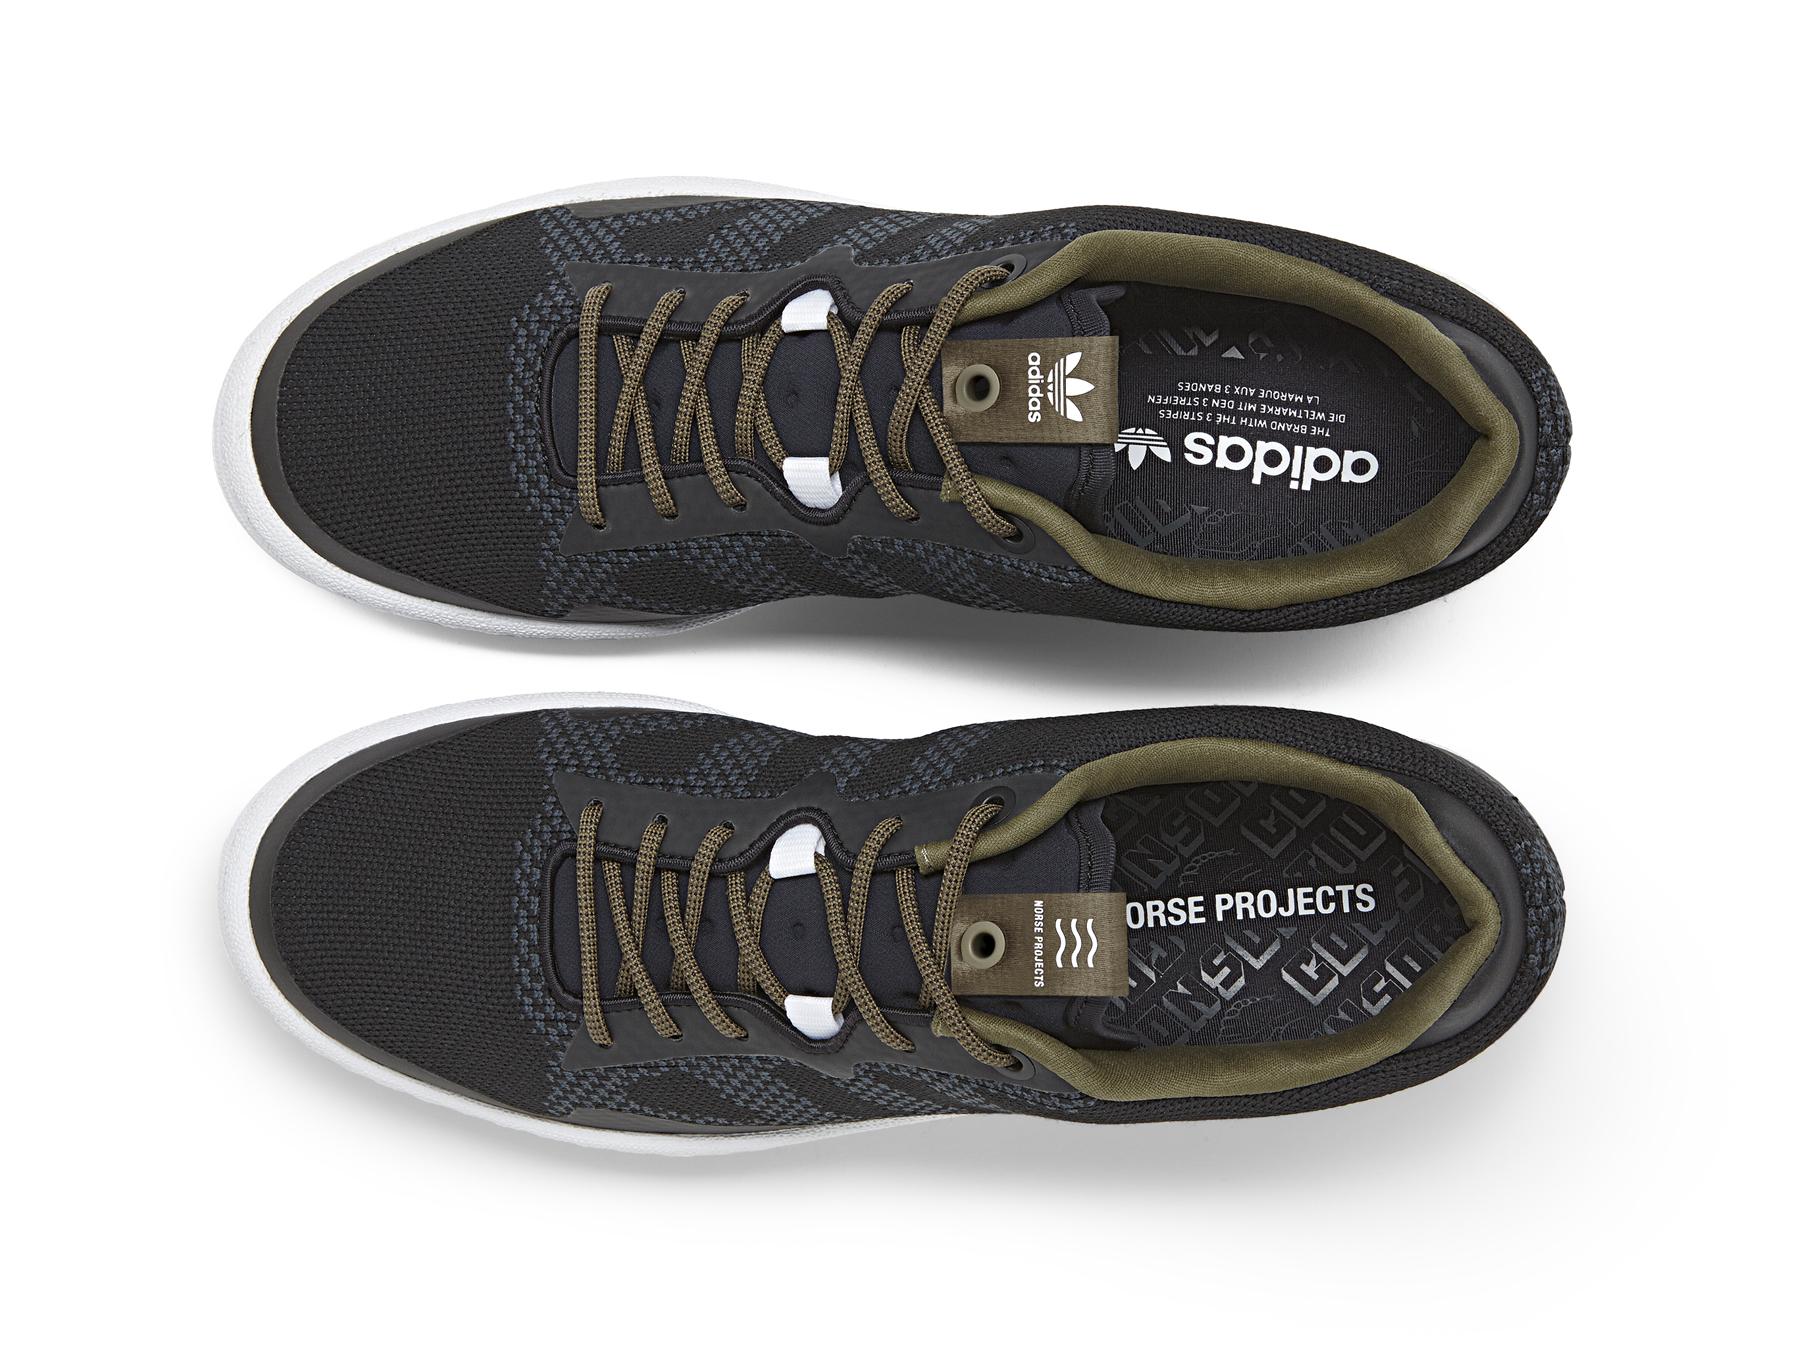 best website 0d46d 2be40 adidas-consortium-norse-projects-campus-terrex. BB5068-02. BB5068-03